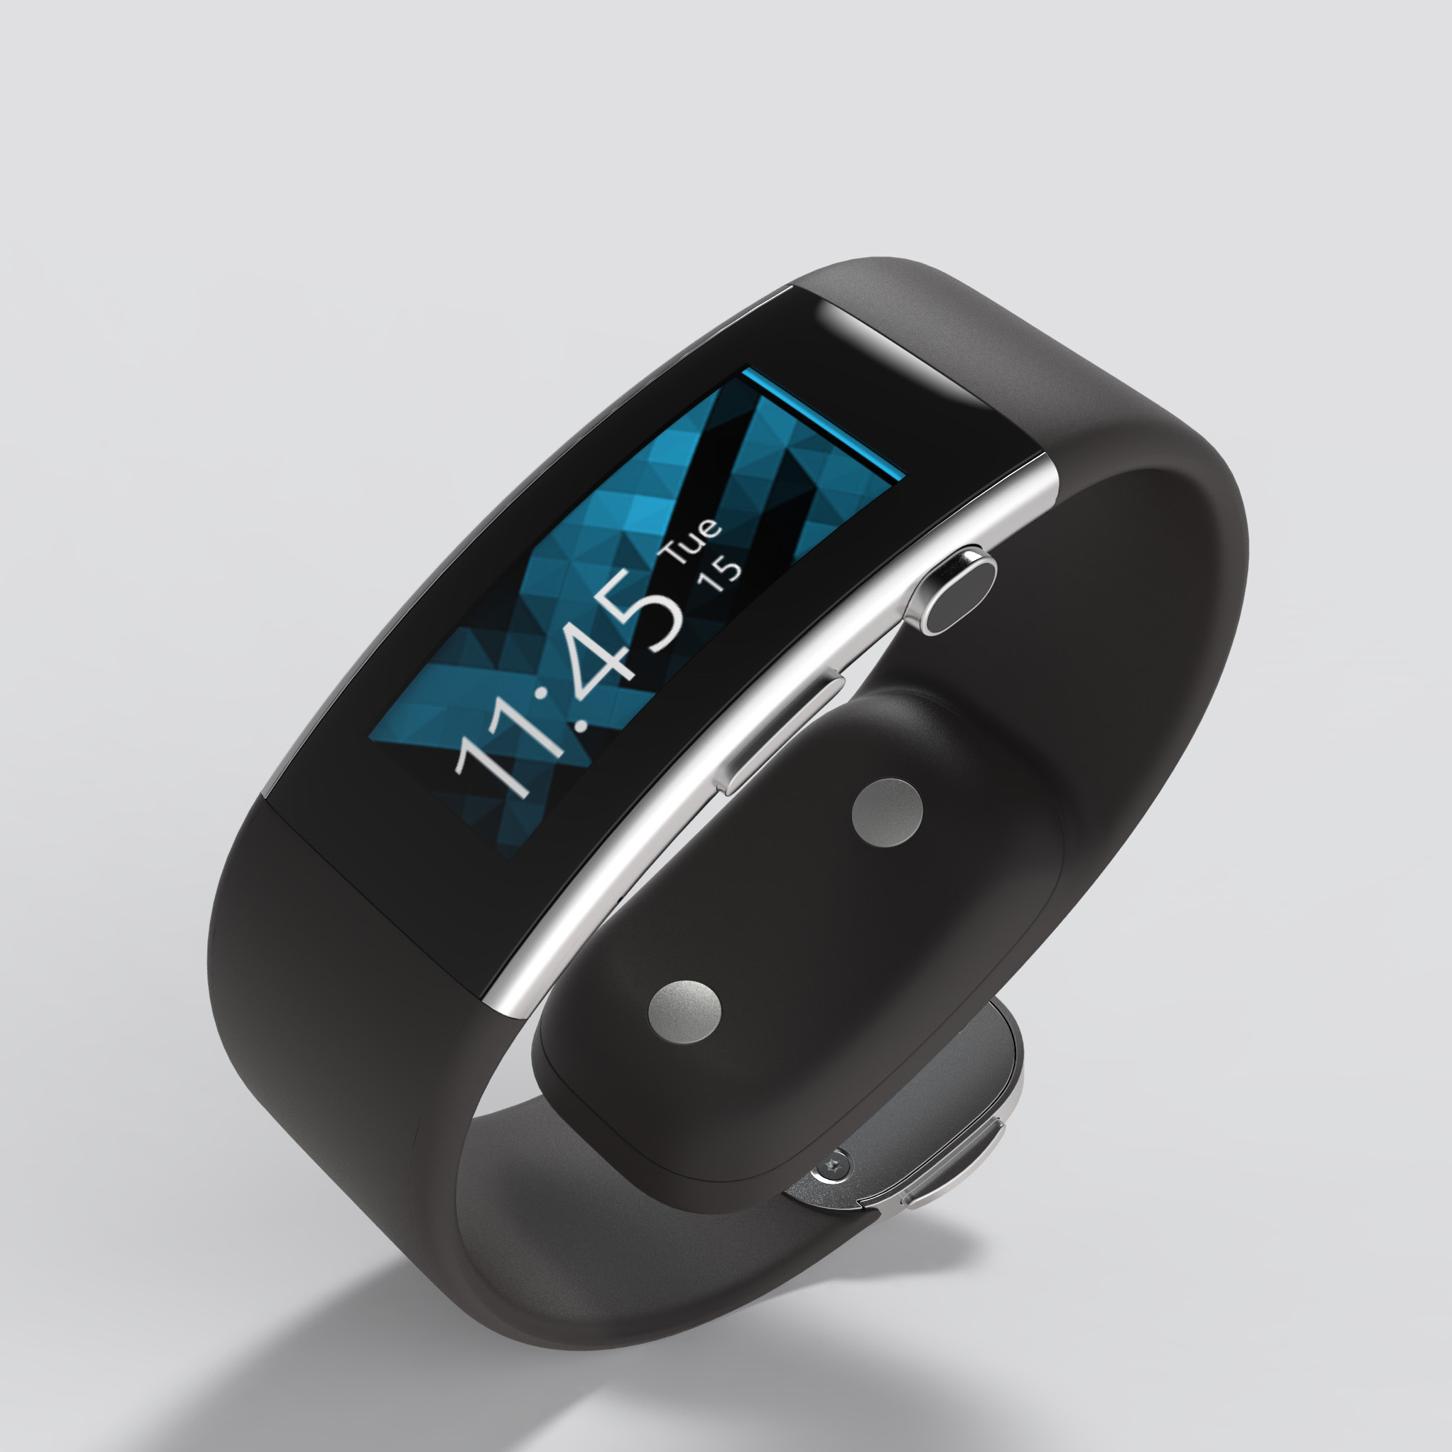 Microsoft Band 2 - Senior Design Lead2014 - 2015